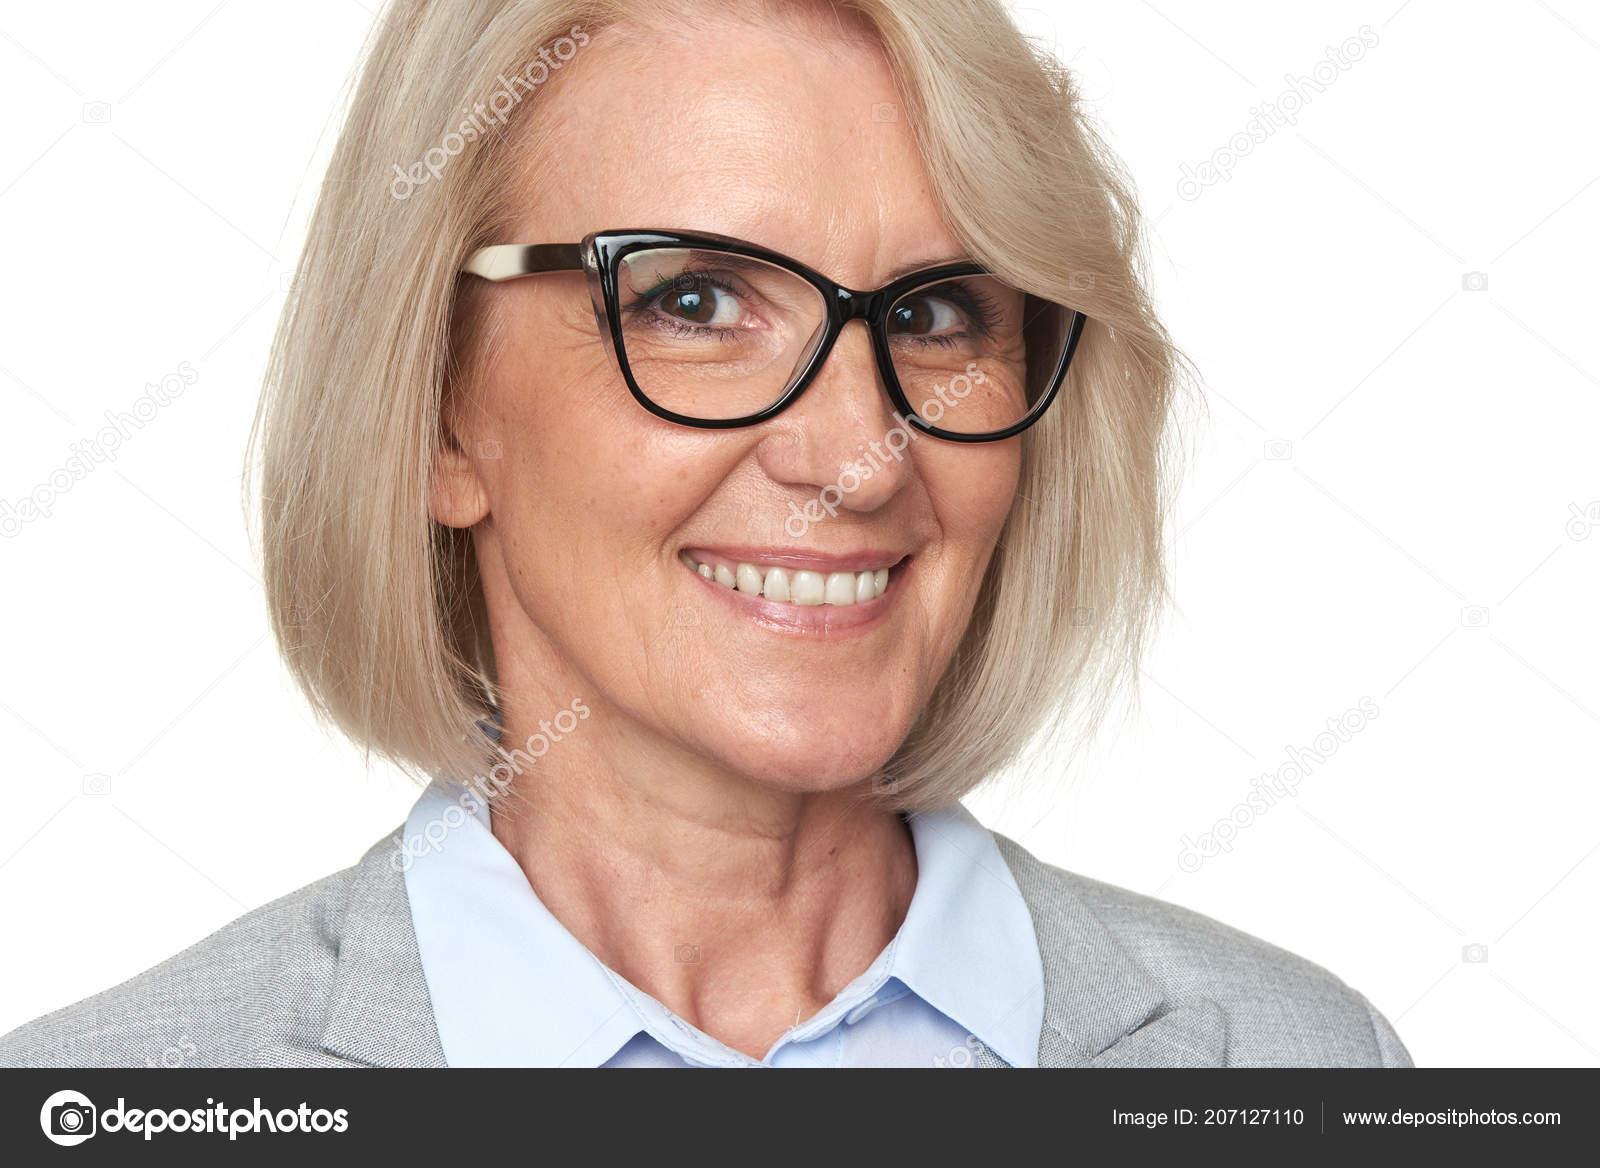 e3048fd02d Όμορφο Ανώτερων Γυναίκα Γυαλιά Είναι Toothy Χαμόγελο Ξανθιά Γριά Που —  Φωτογραφία Αρχείου